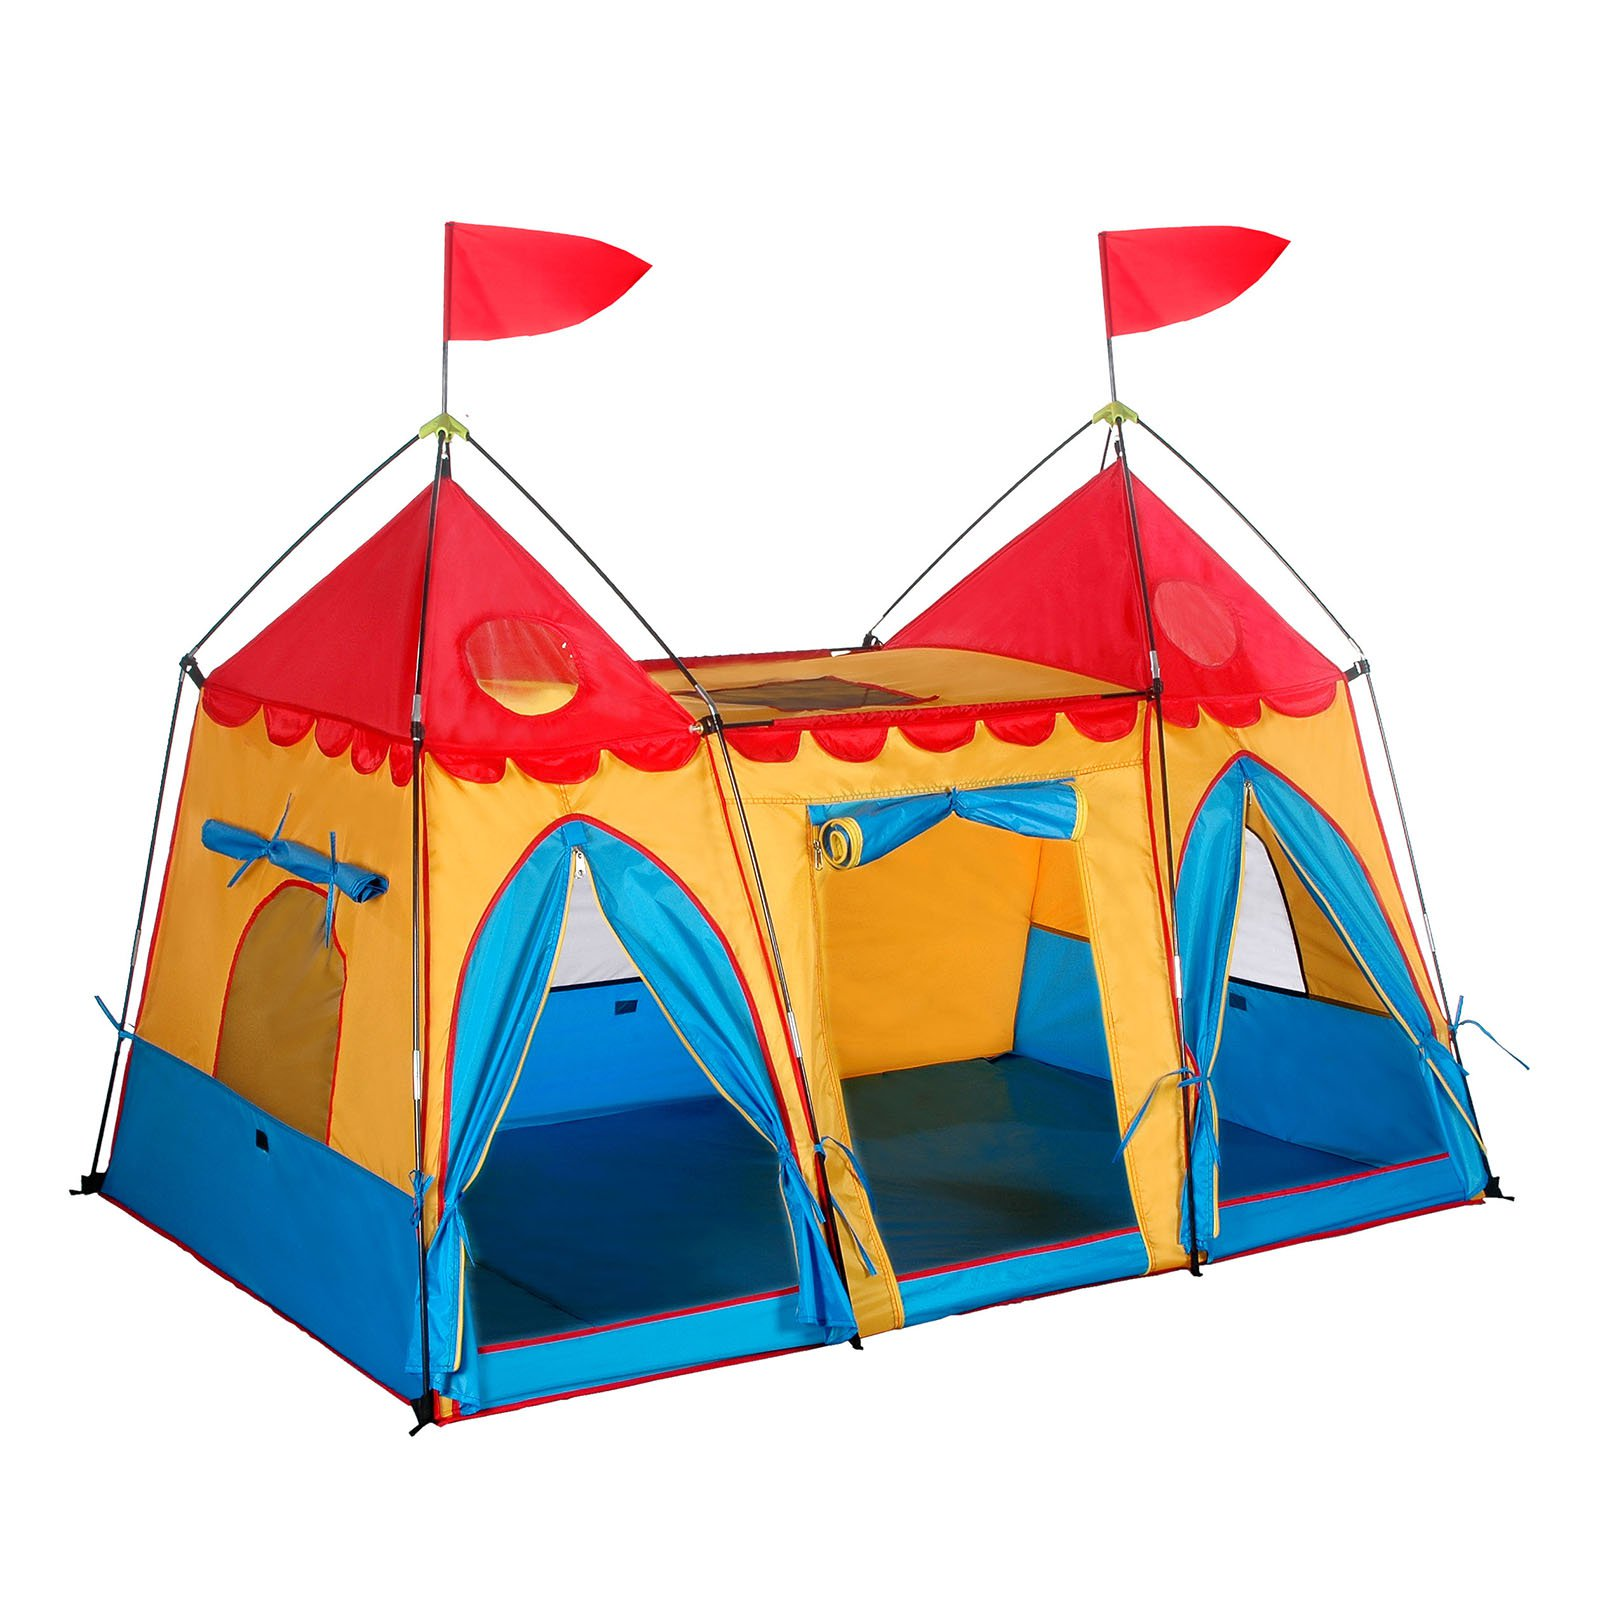 Gigatent Fantasy Palace Play Tent - Walmart.com